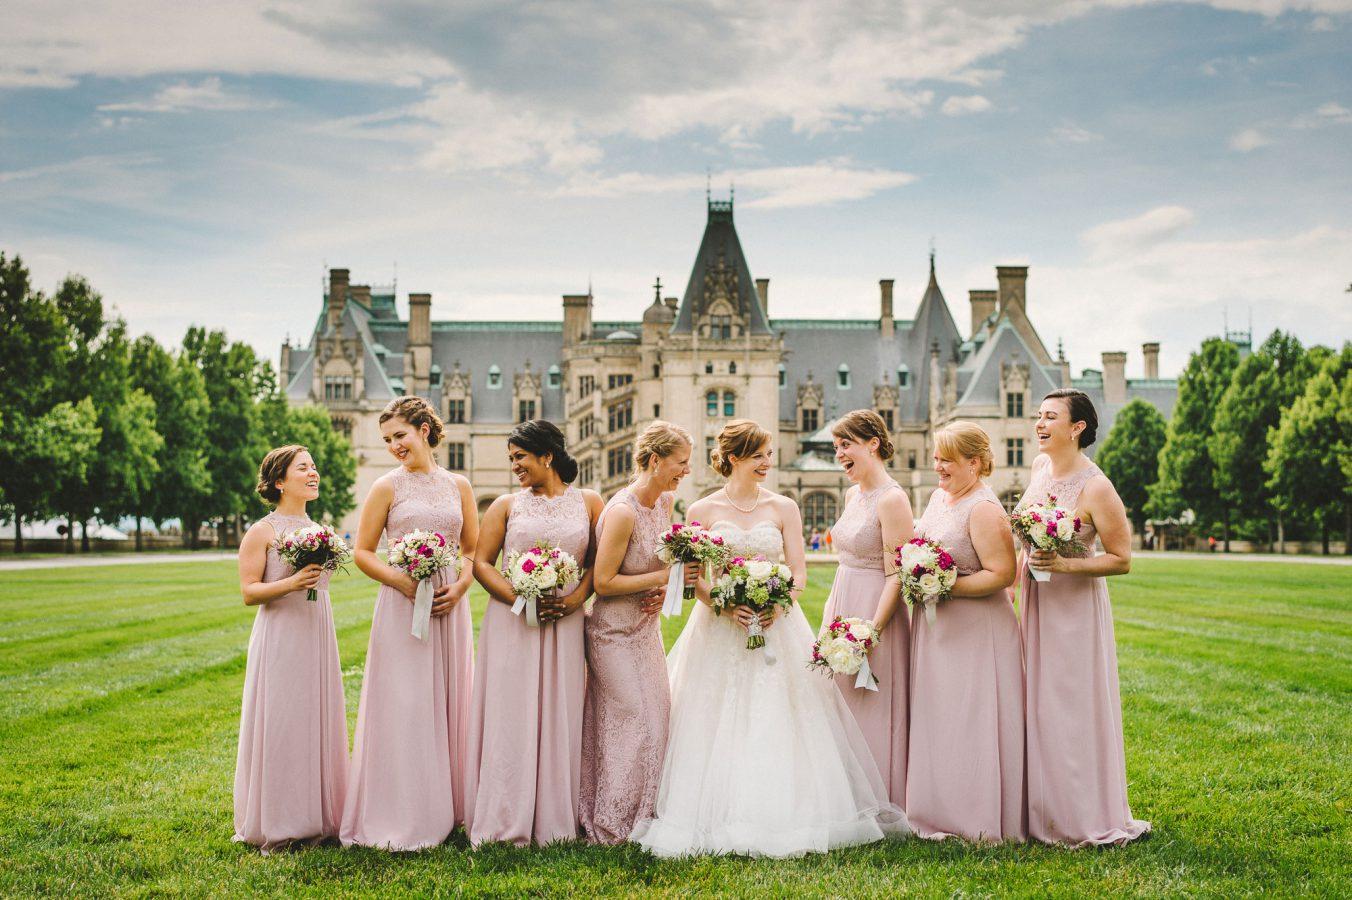 wedding-photography-2016-09-biltmore-estate